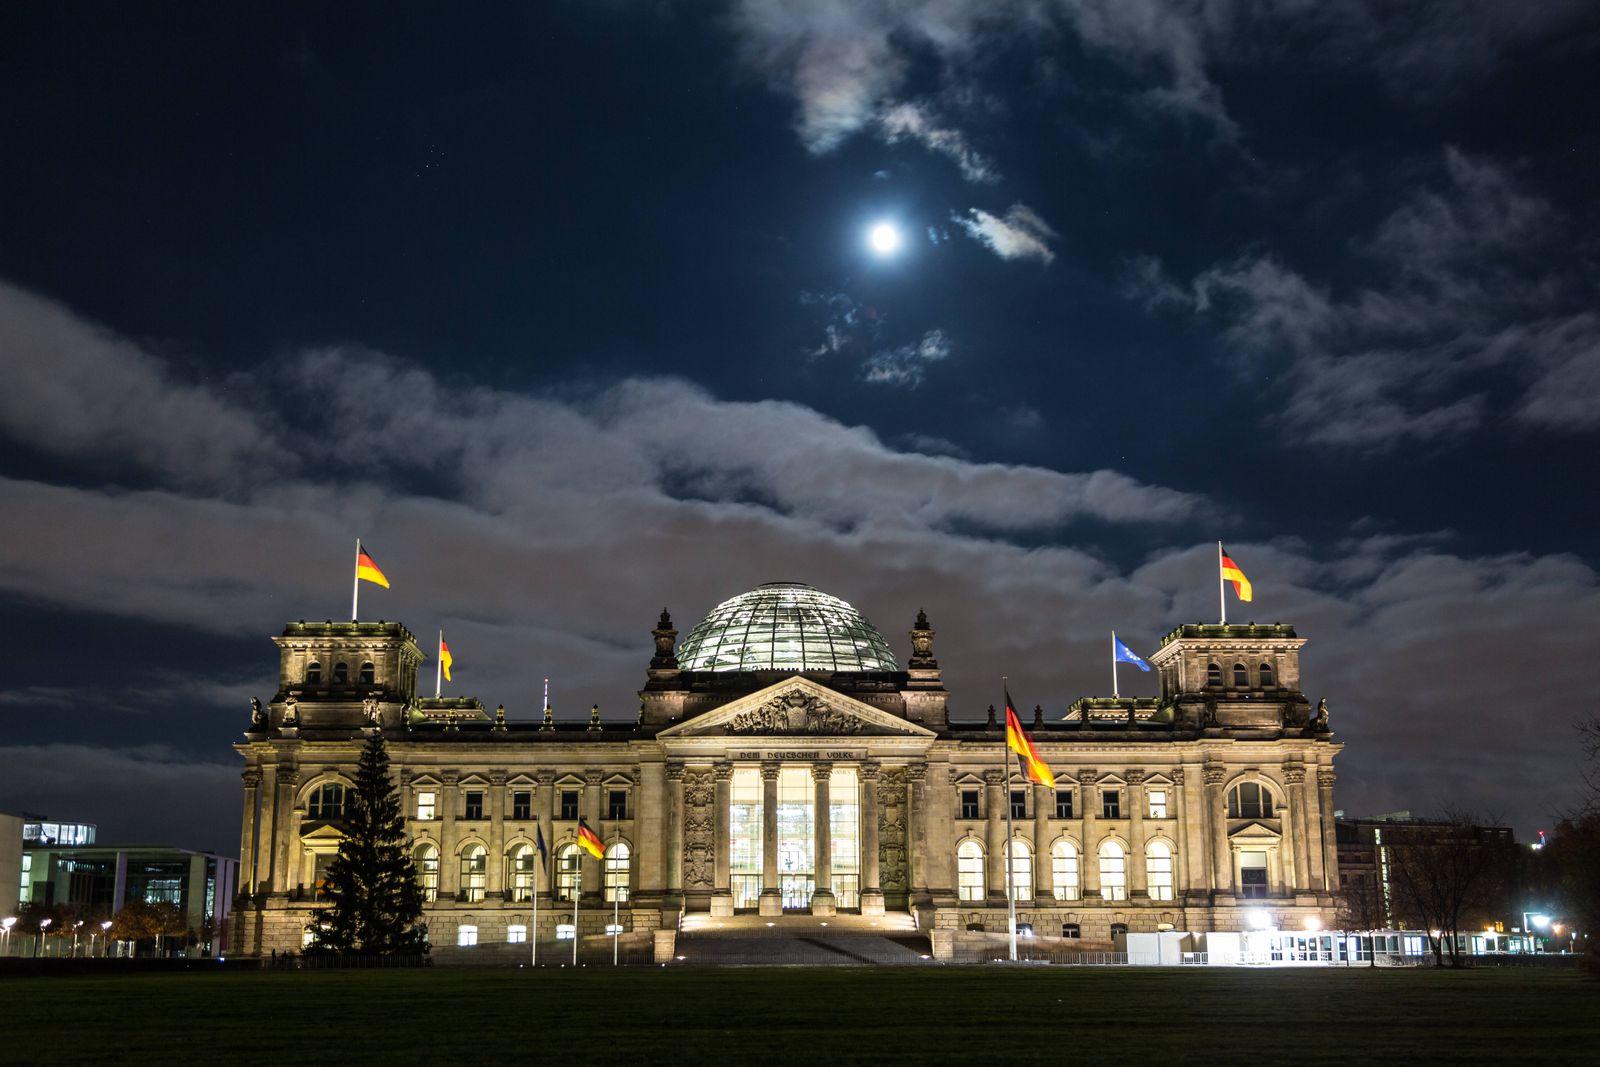 Bundestag mit Mond am Abend am 28.11.2020 *** Bundestag with moon in the evening on 28 11 2020